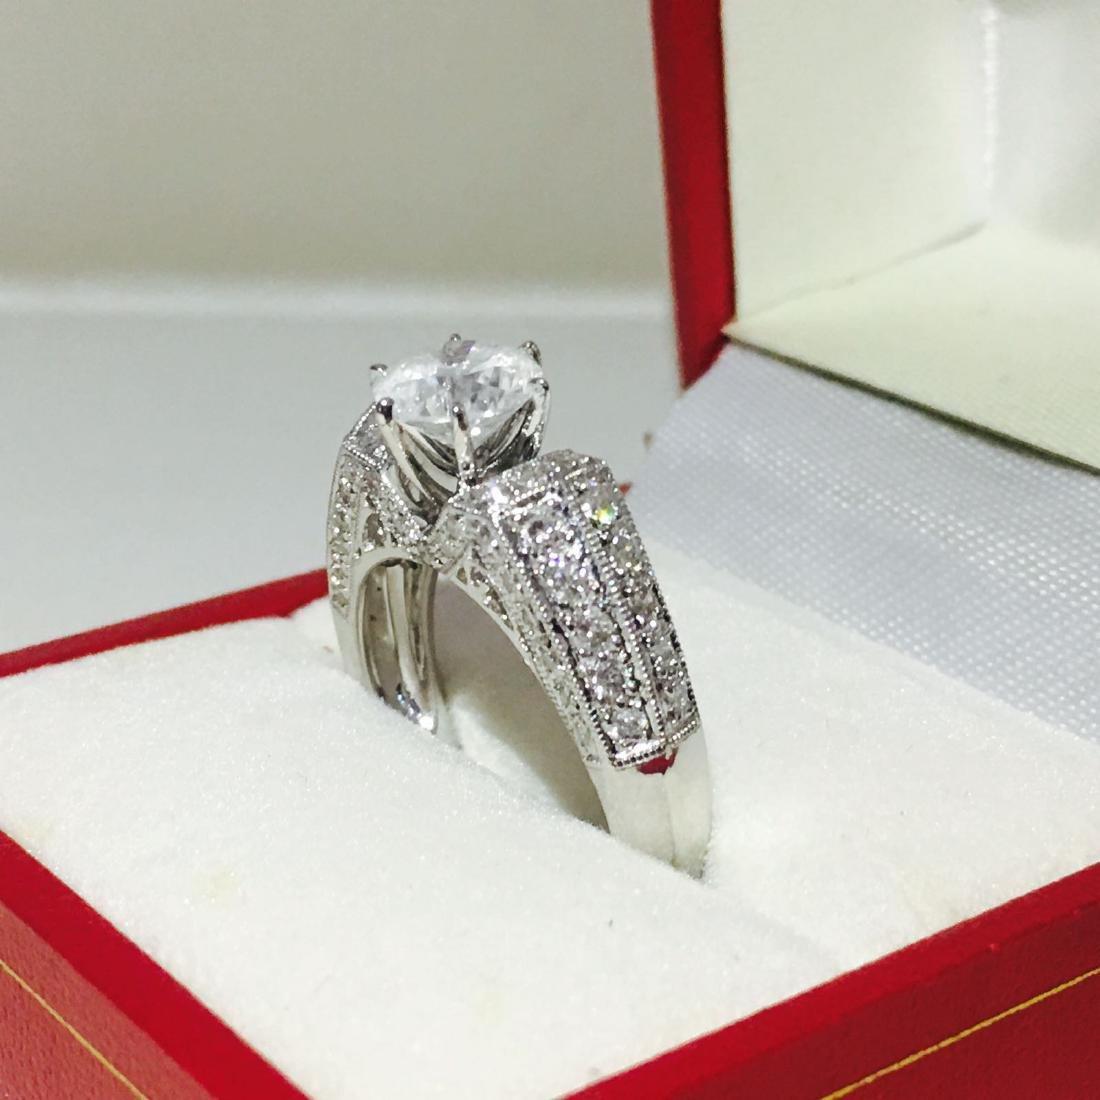 18K White Gold, 2.10 CT Diamond Engagement Ring - 5